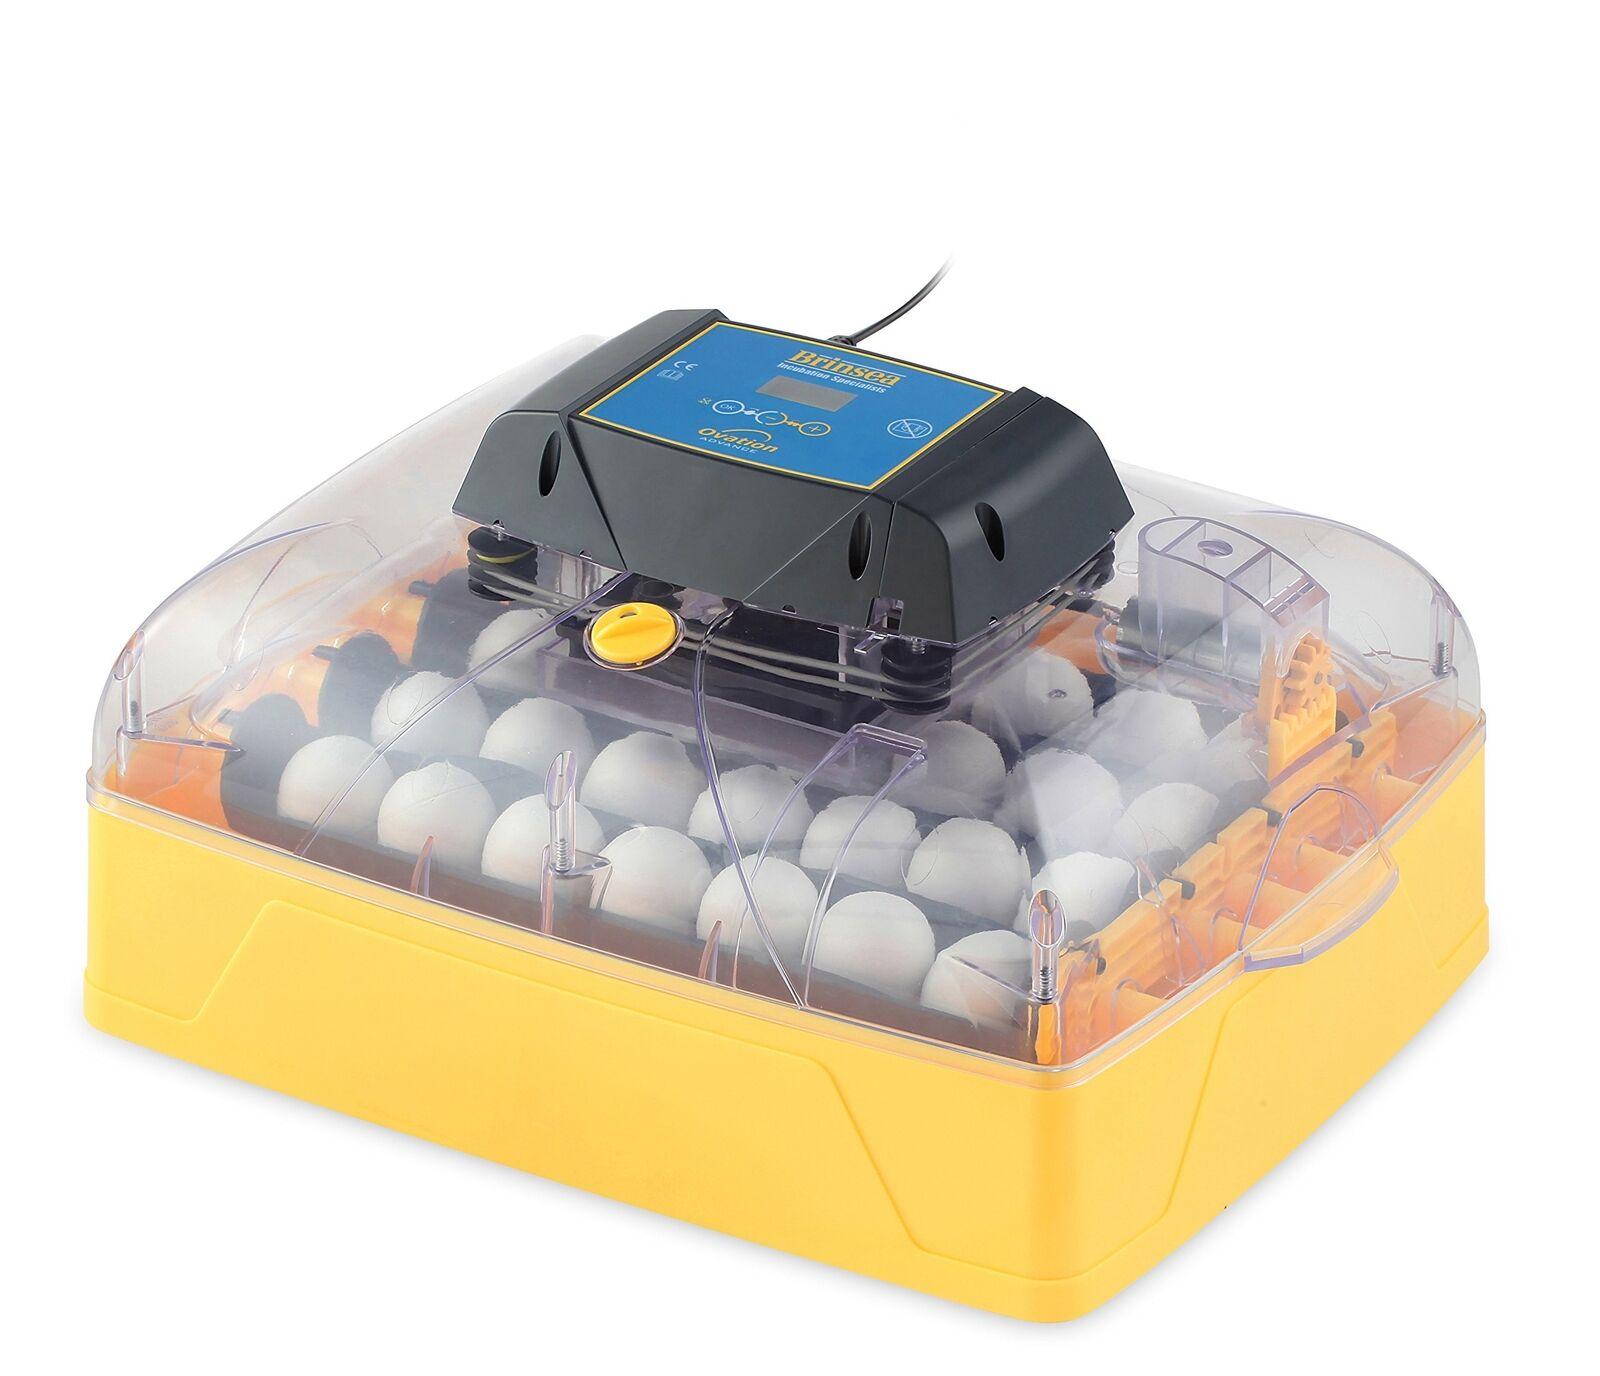 Brinsea Products USAF36C Ovation 28 Advance Automatic Egg Incubator One Dimensione